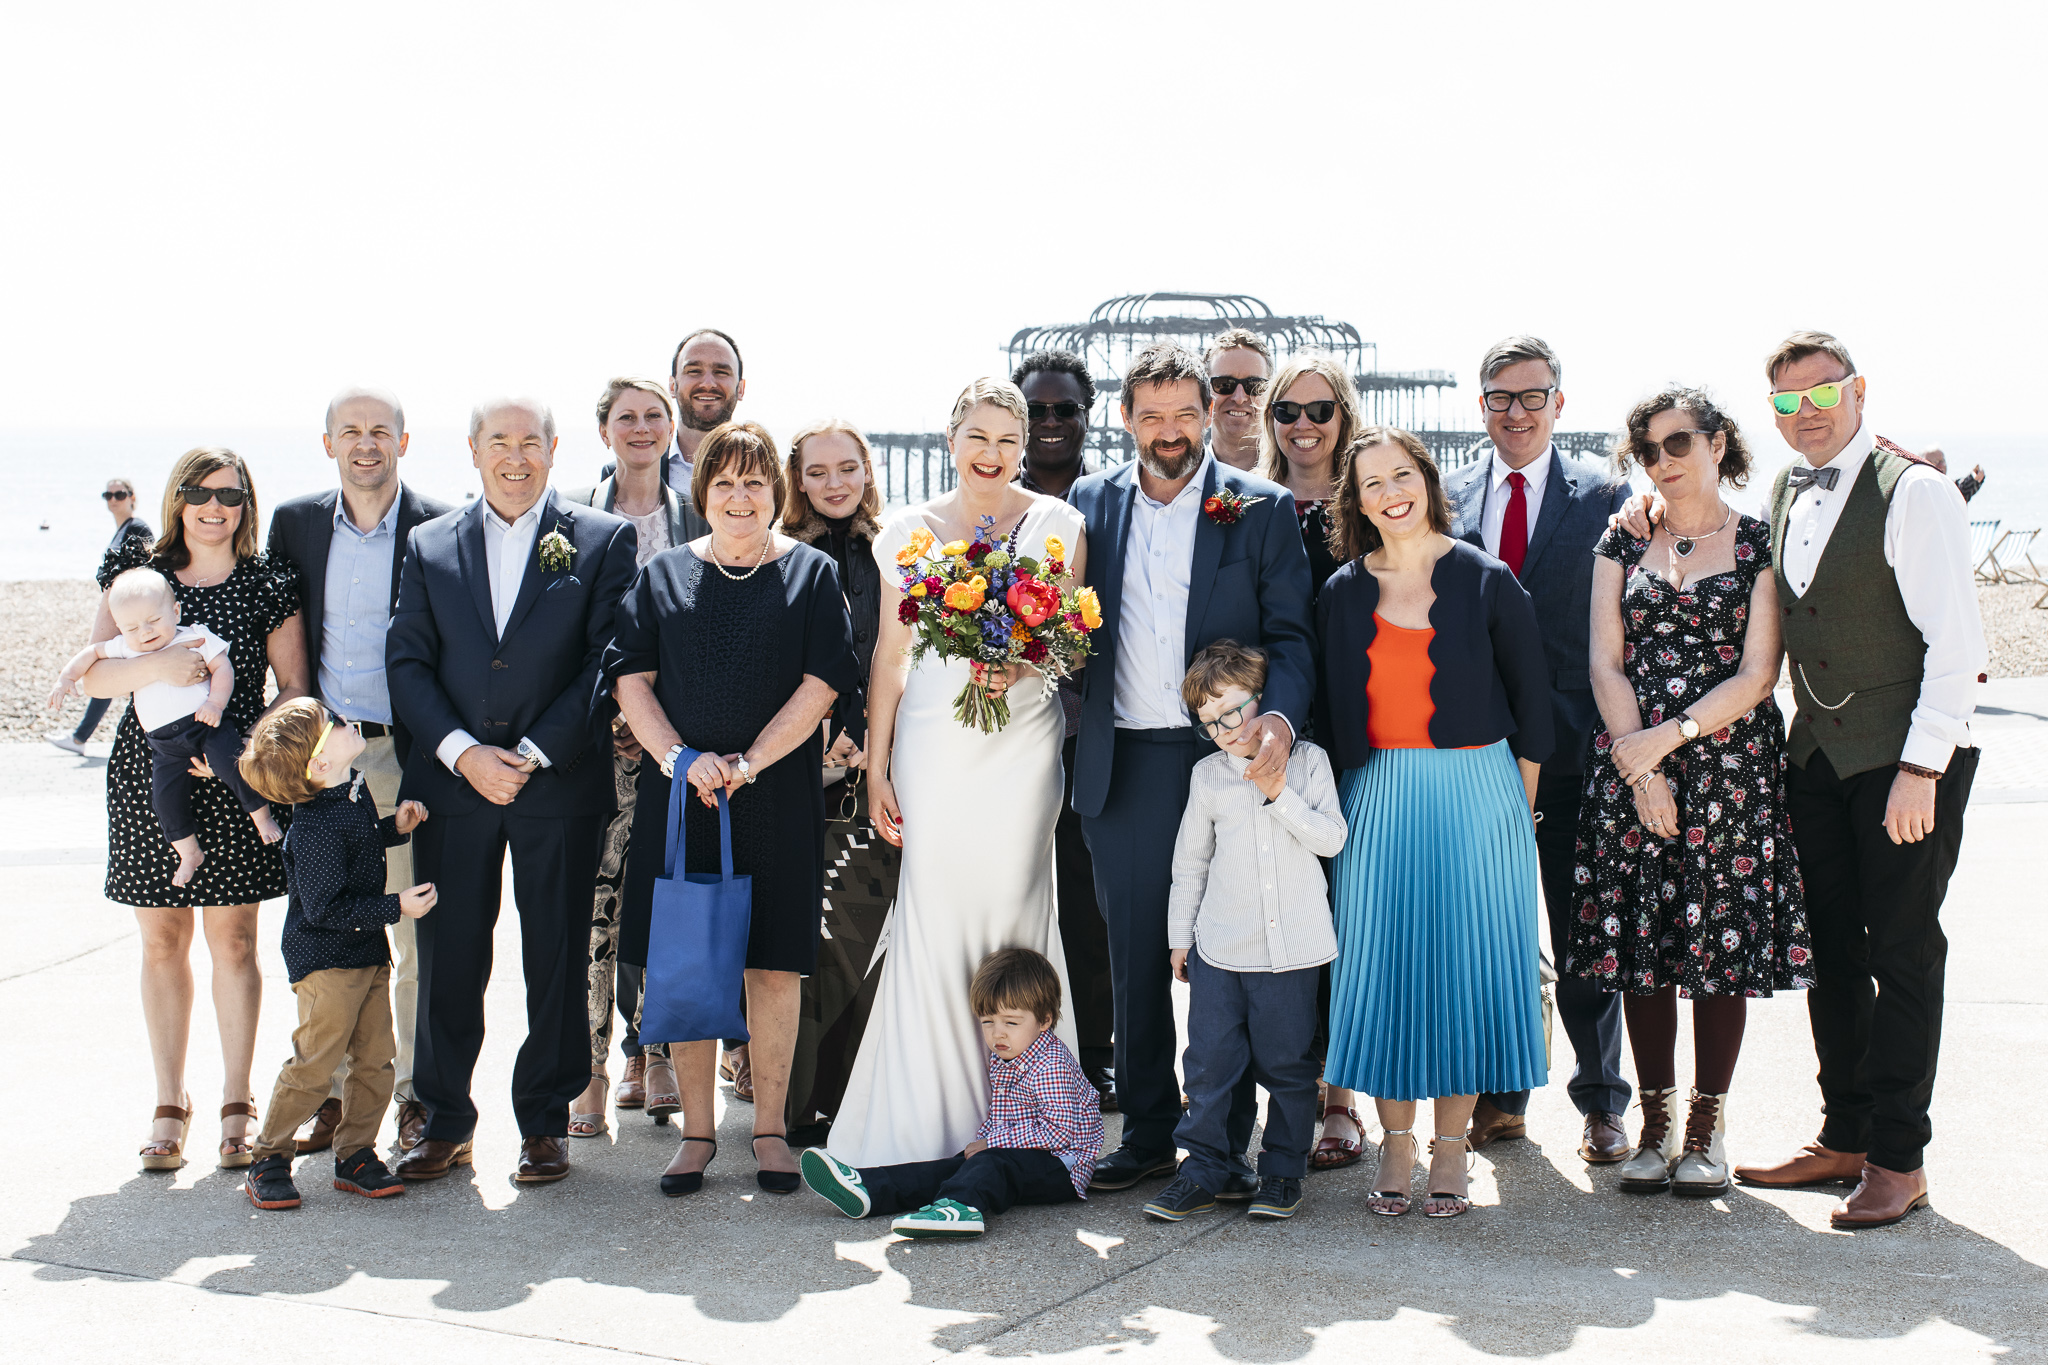 short_coverage_wedding_photographer_brighton_032.jpg